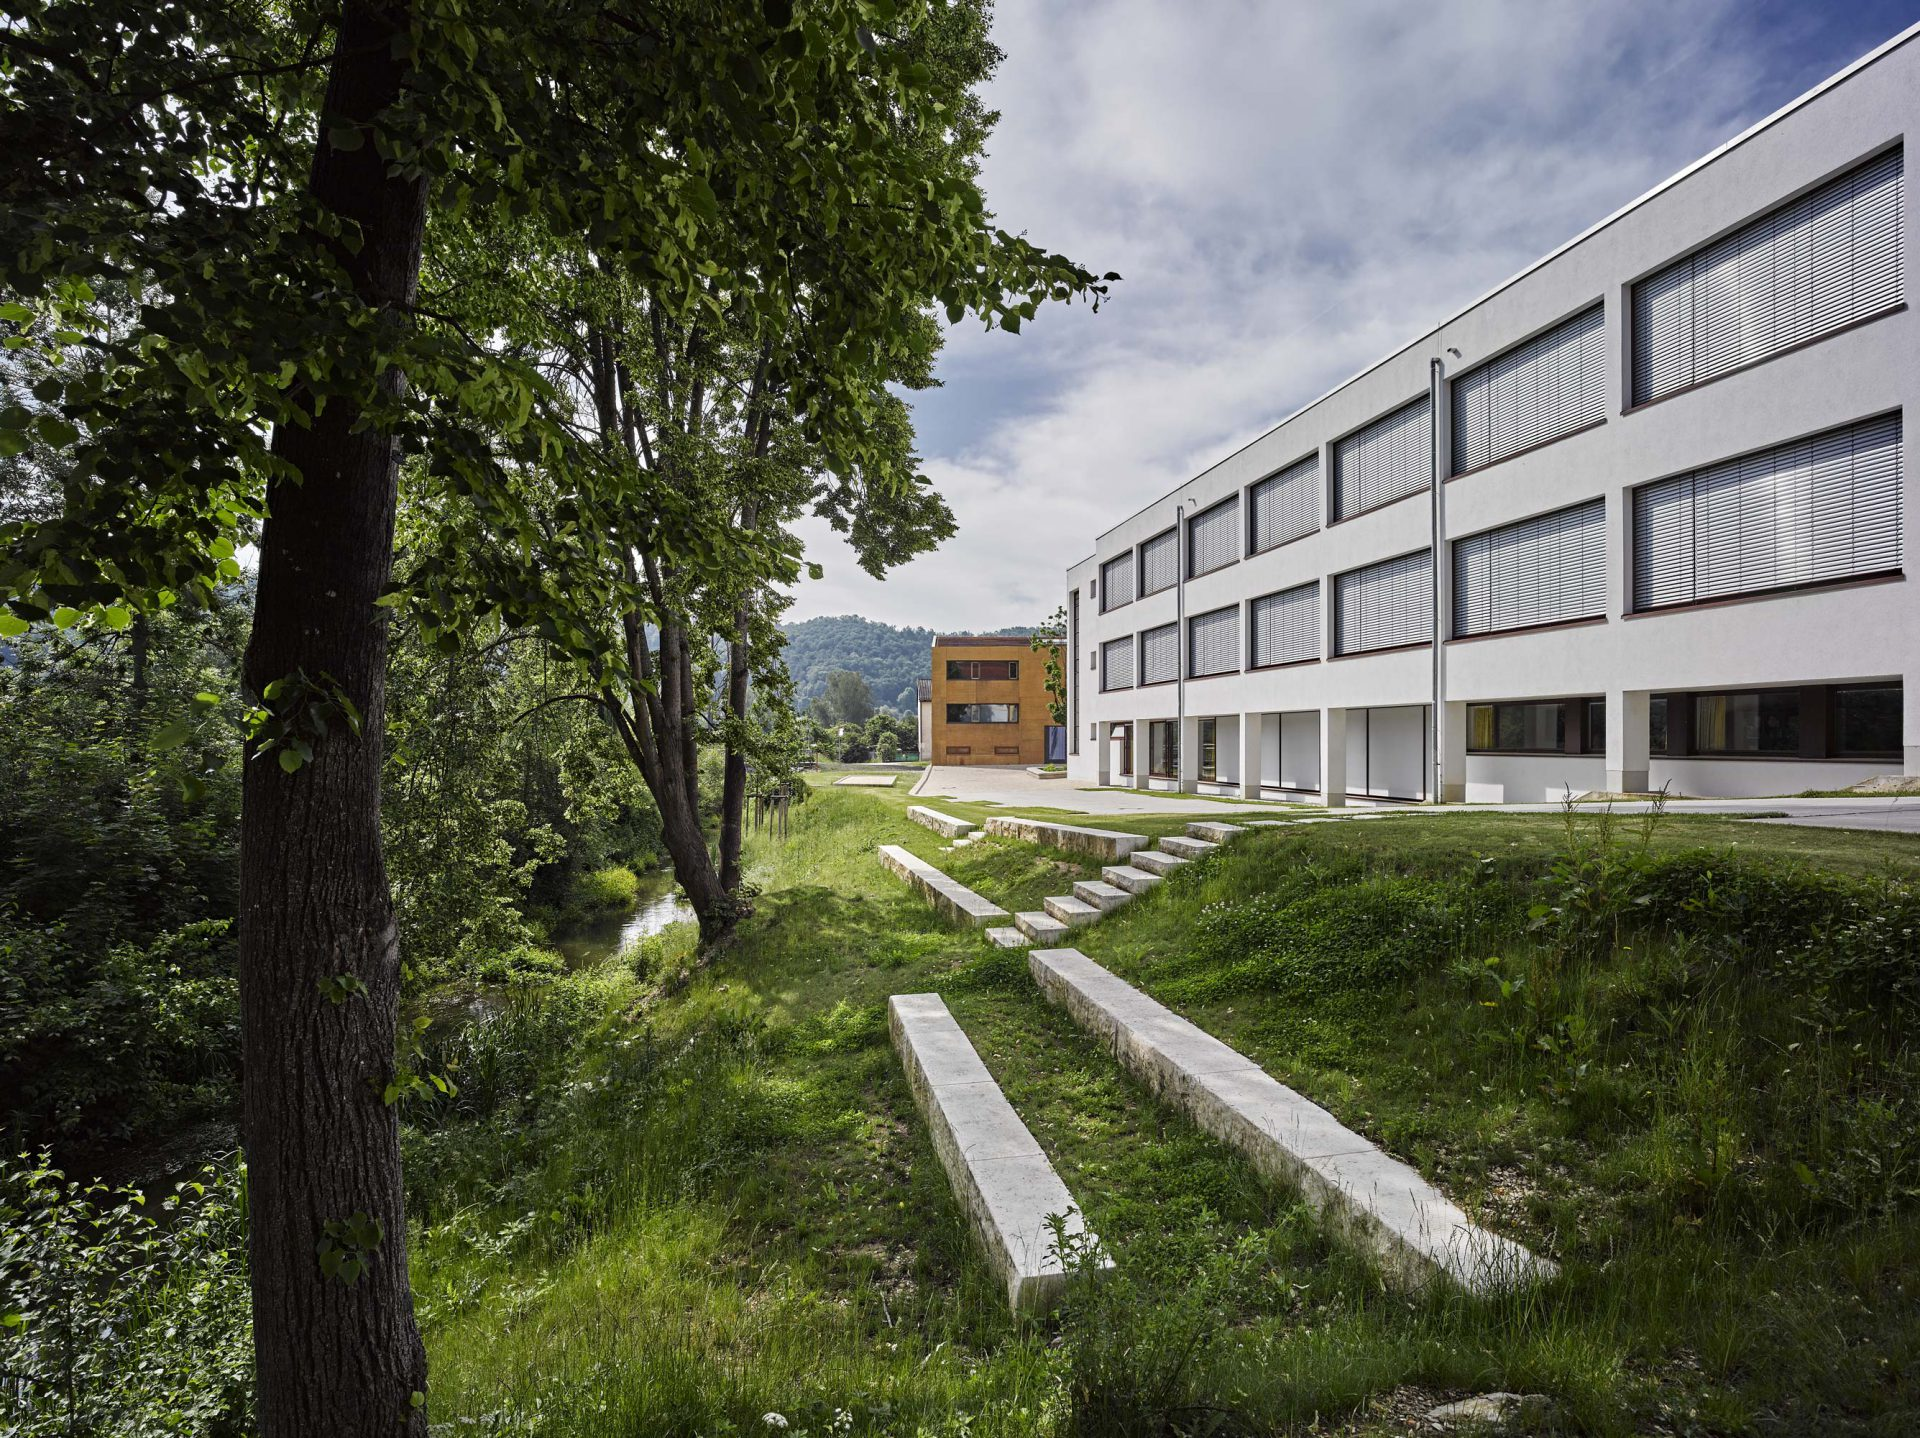 LAW-Rebdorf-180529-0028-02